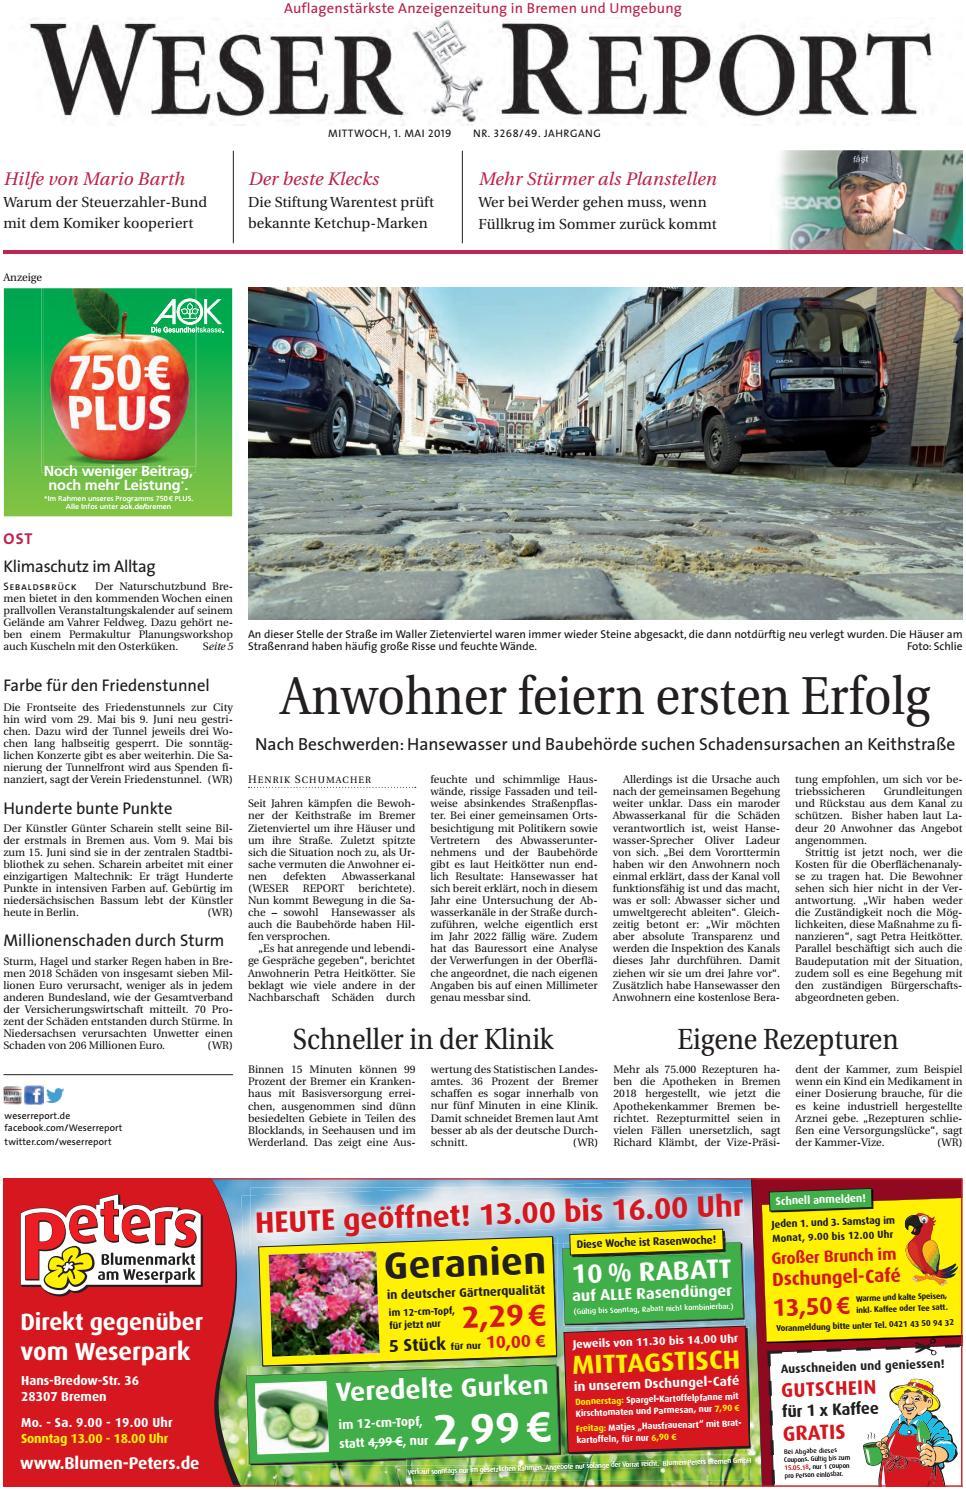 Weser Report Ost vom 01.05.2019 by KPS Verlagsgesellschaft